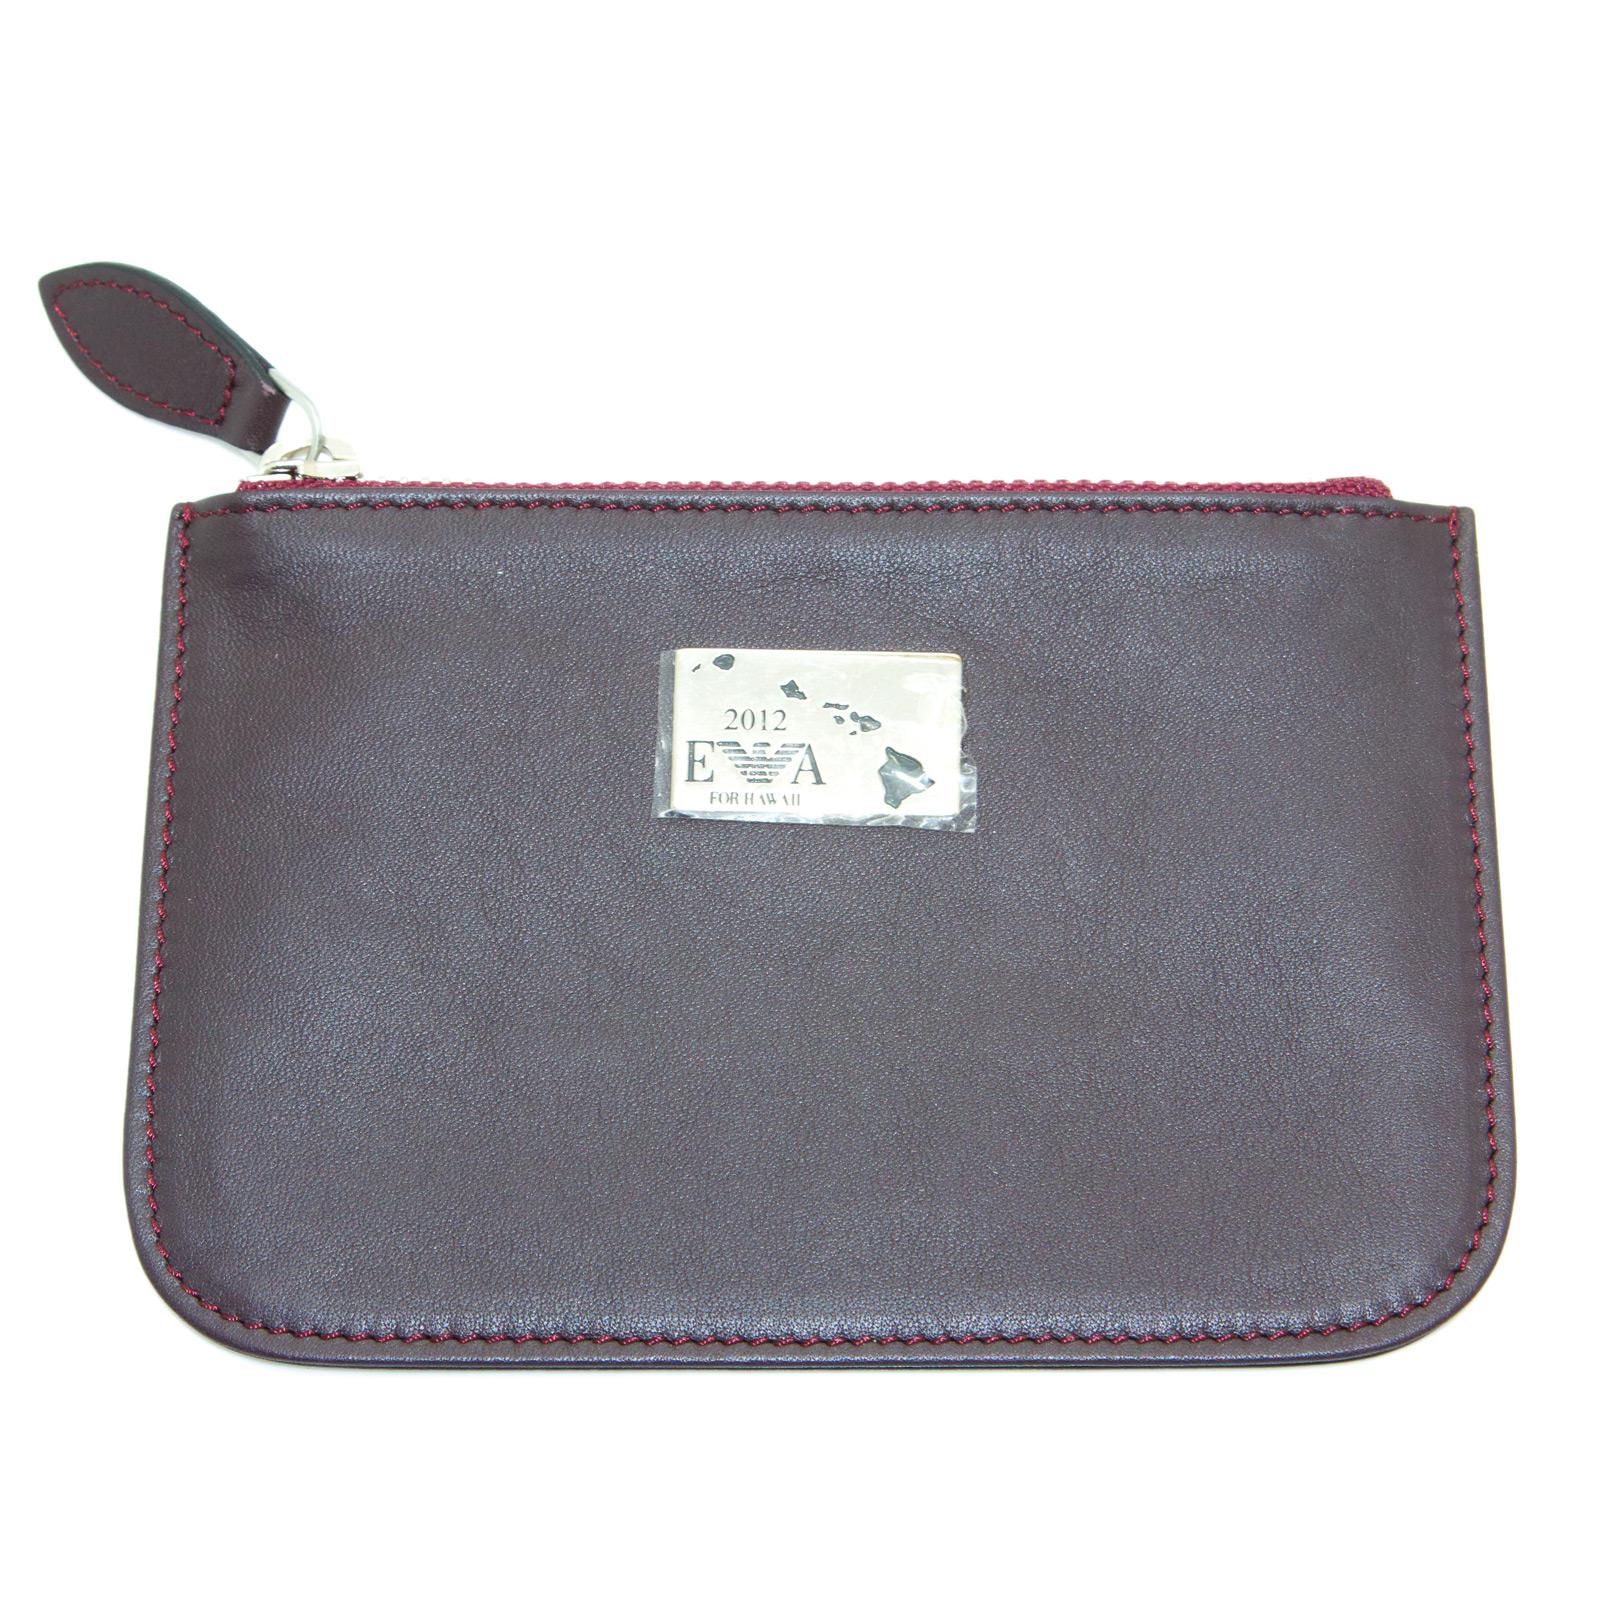 EMPORIO-ARMANI-Women-039-s-034-2012-034-Zip-Top-Coin-Purse-Wallet-YEMG99-195-NWT thumbnail 11